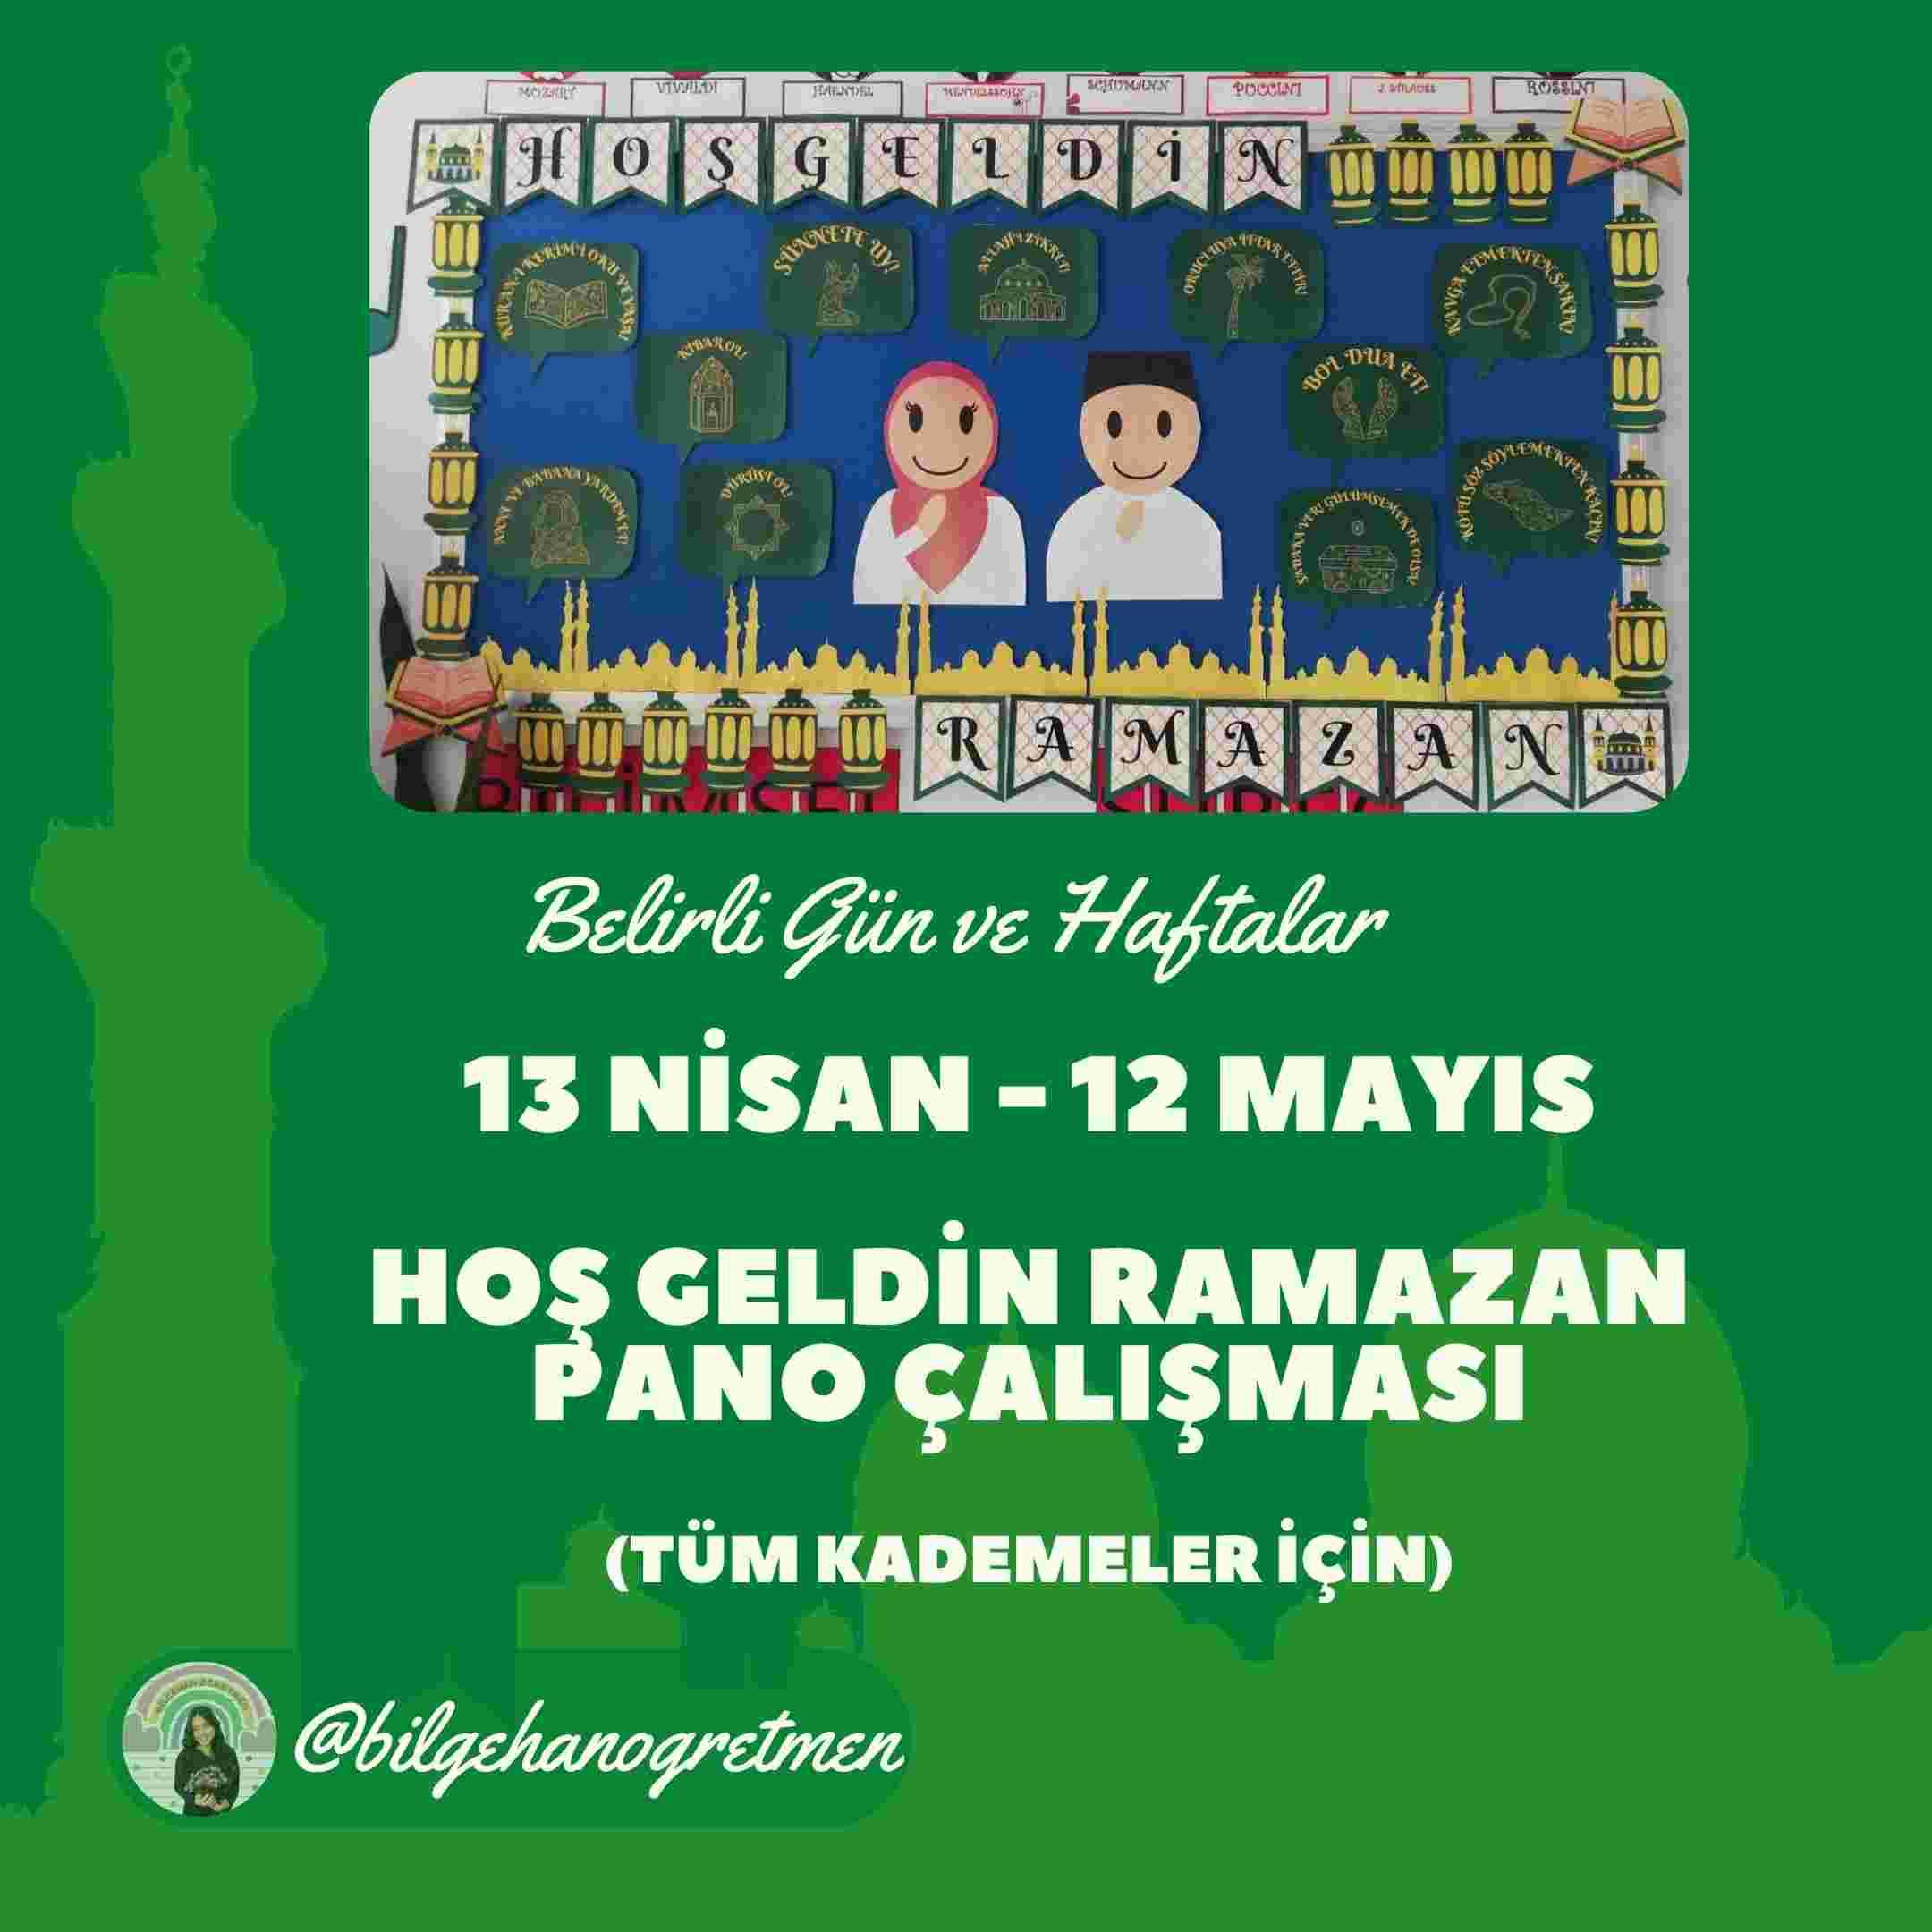 13 NİSAN-12 MAYIS RAMAZAN PANOSU